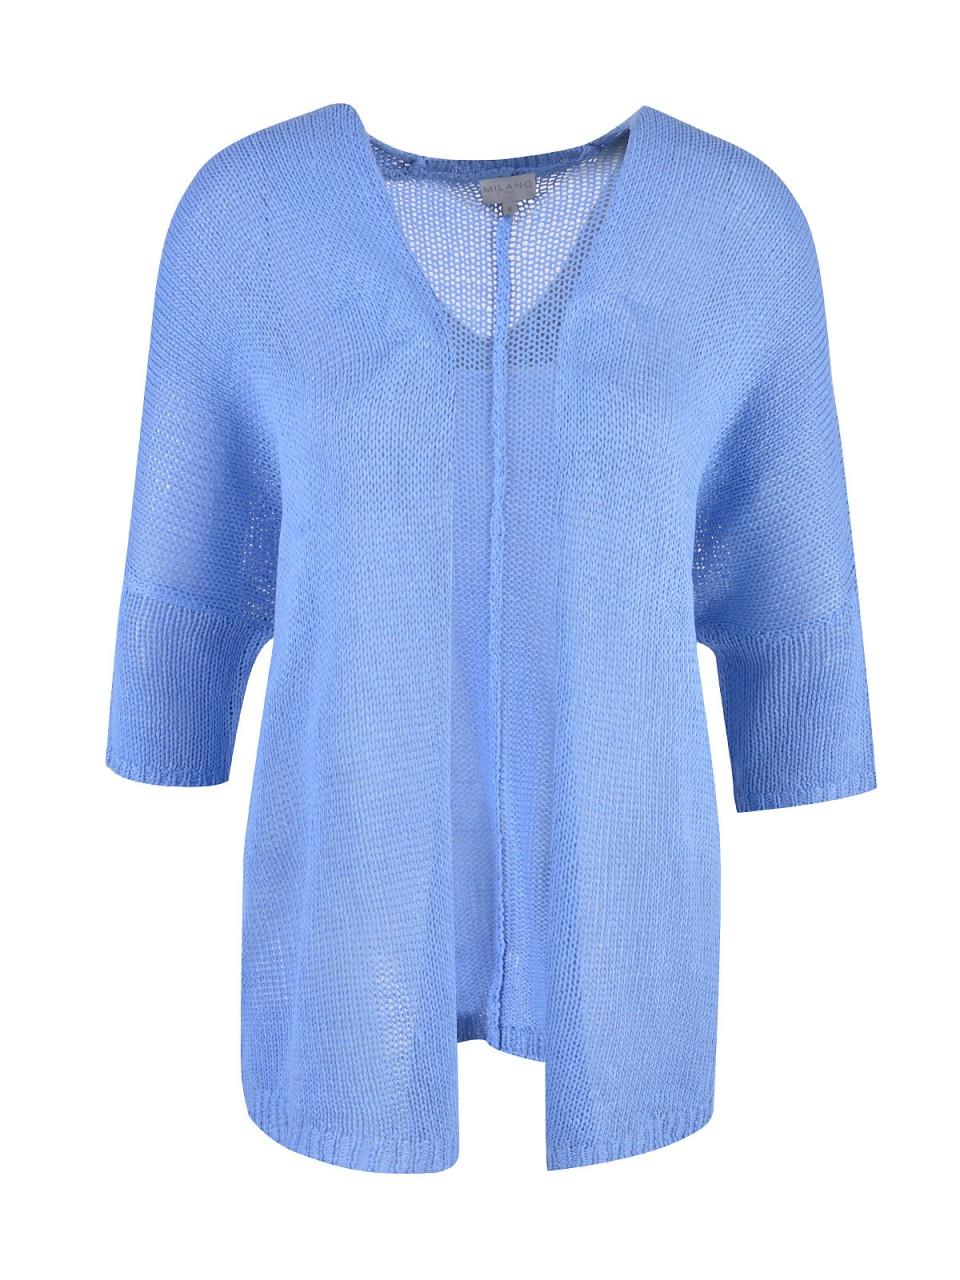 Jacken - MILANO ITALY Damen Cardigan, hellblau  - Onlineshop Designermode.com